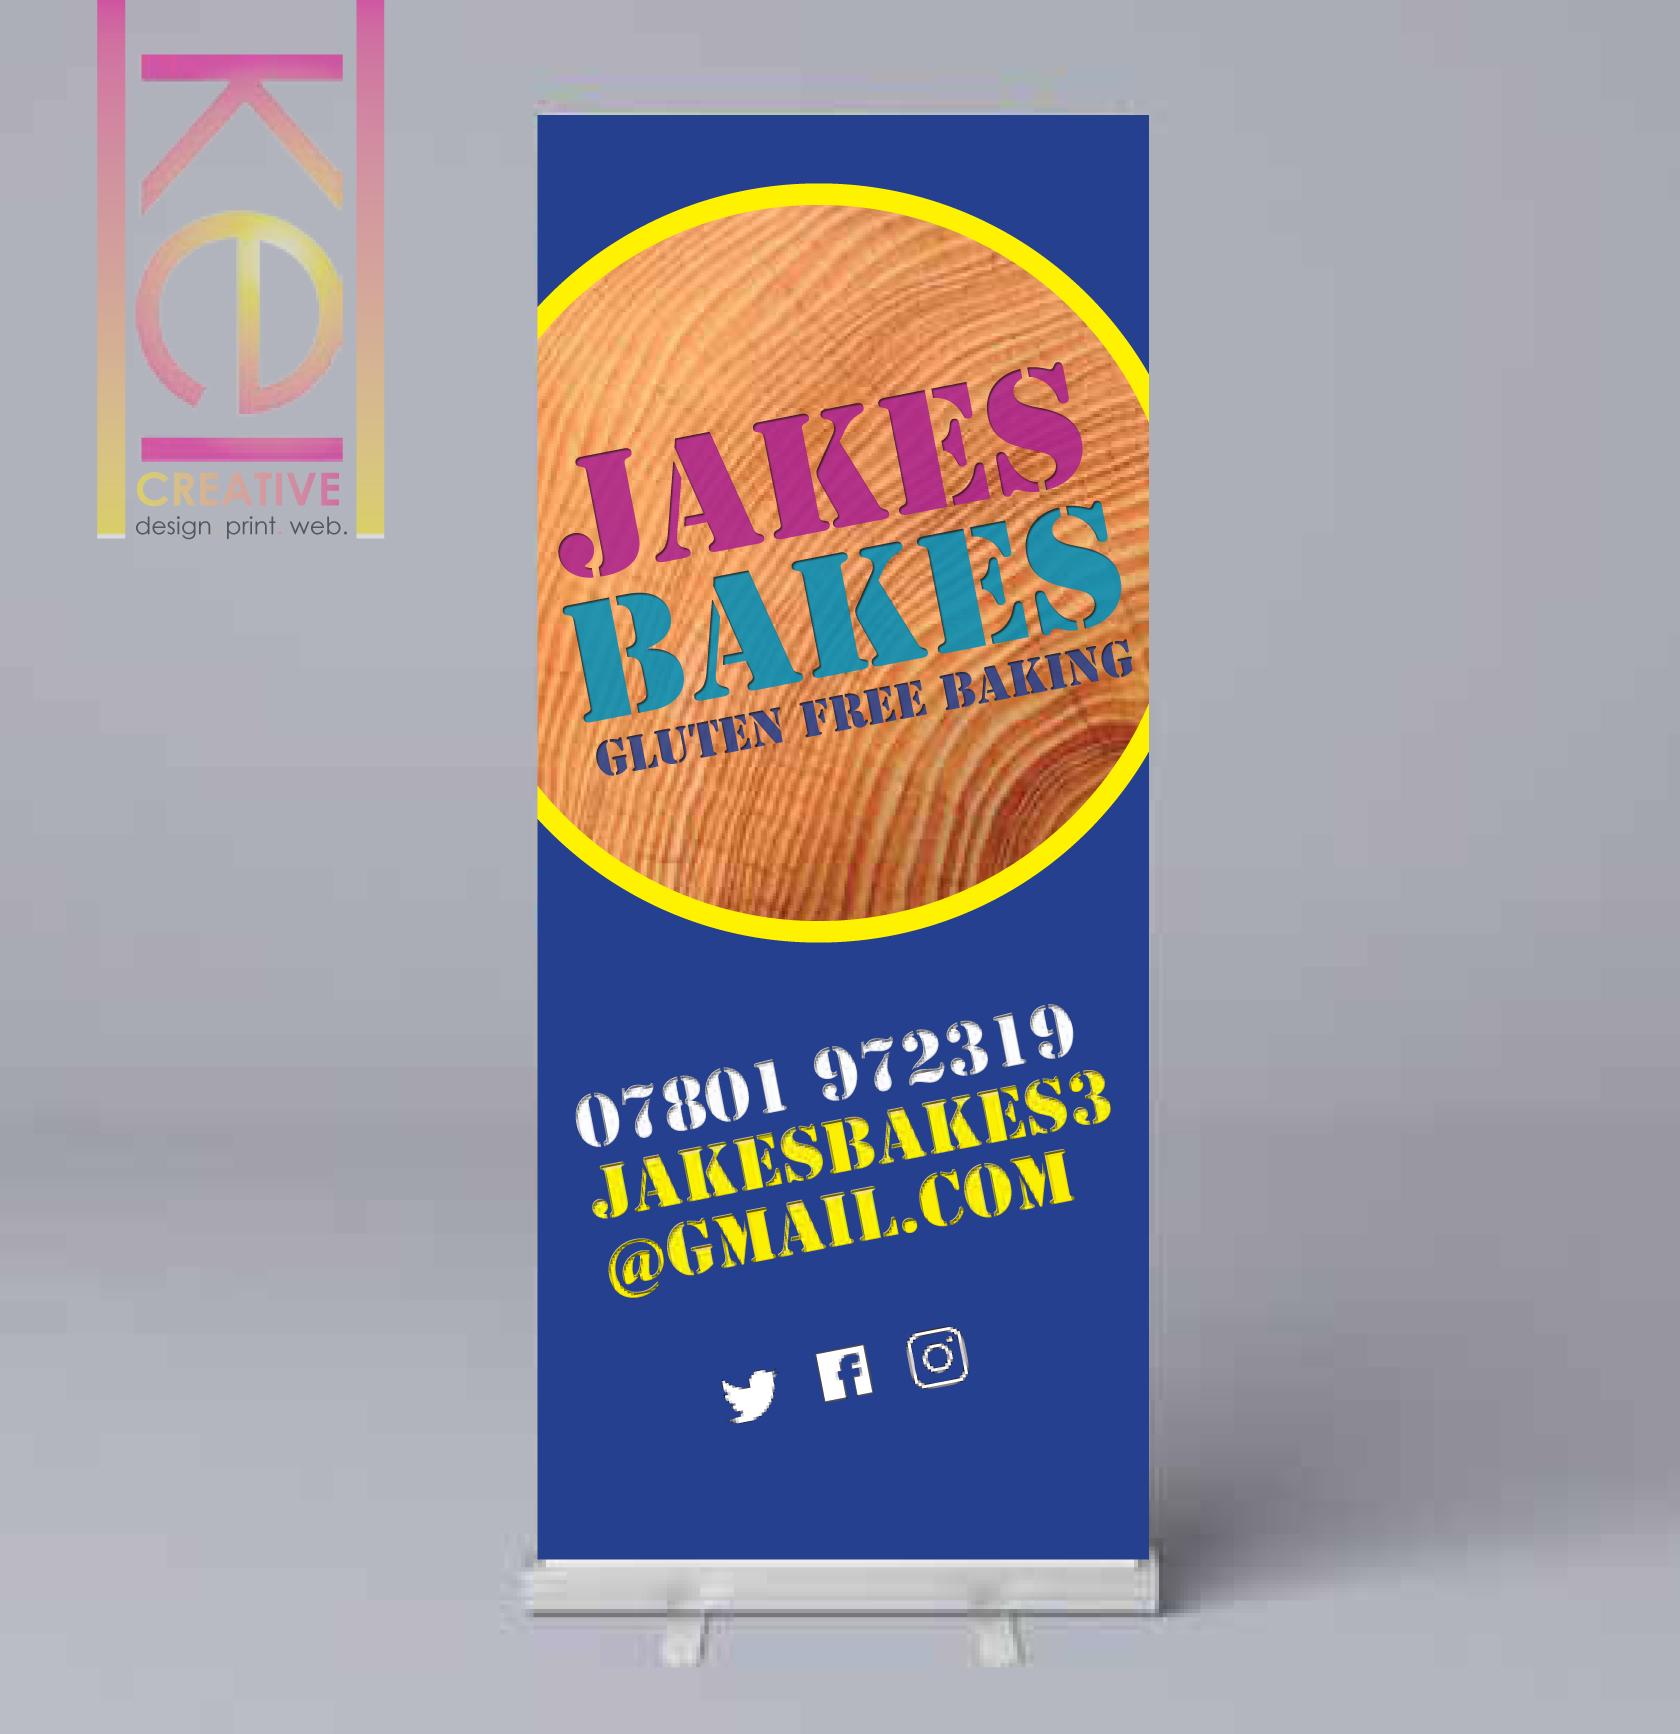 JakesBakes